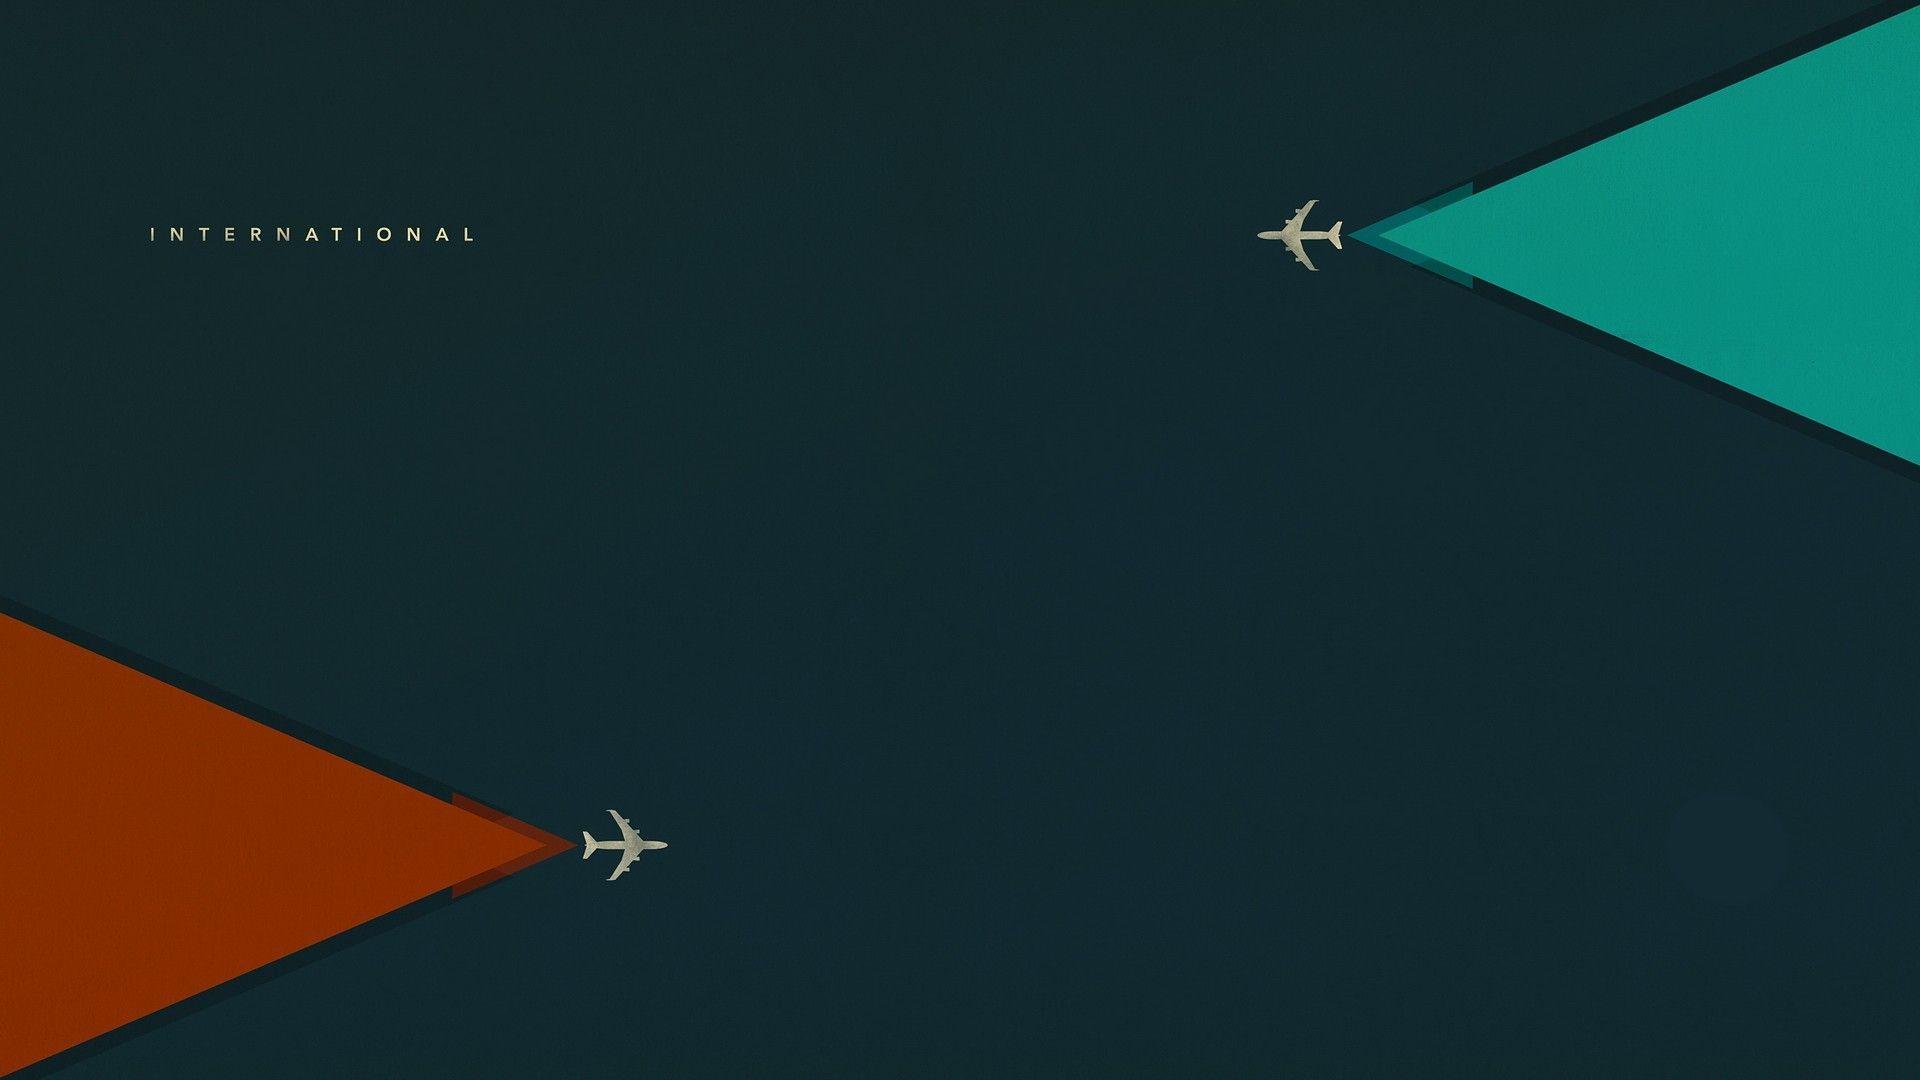 Minimalist Airplane Wallpapers Top Free Minimalist Airplane Backgrounds Wallpaperaccess